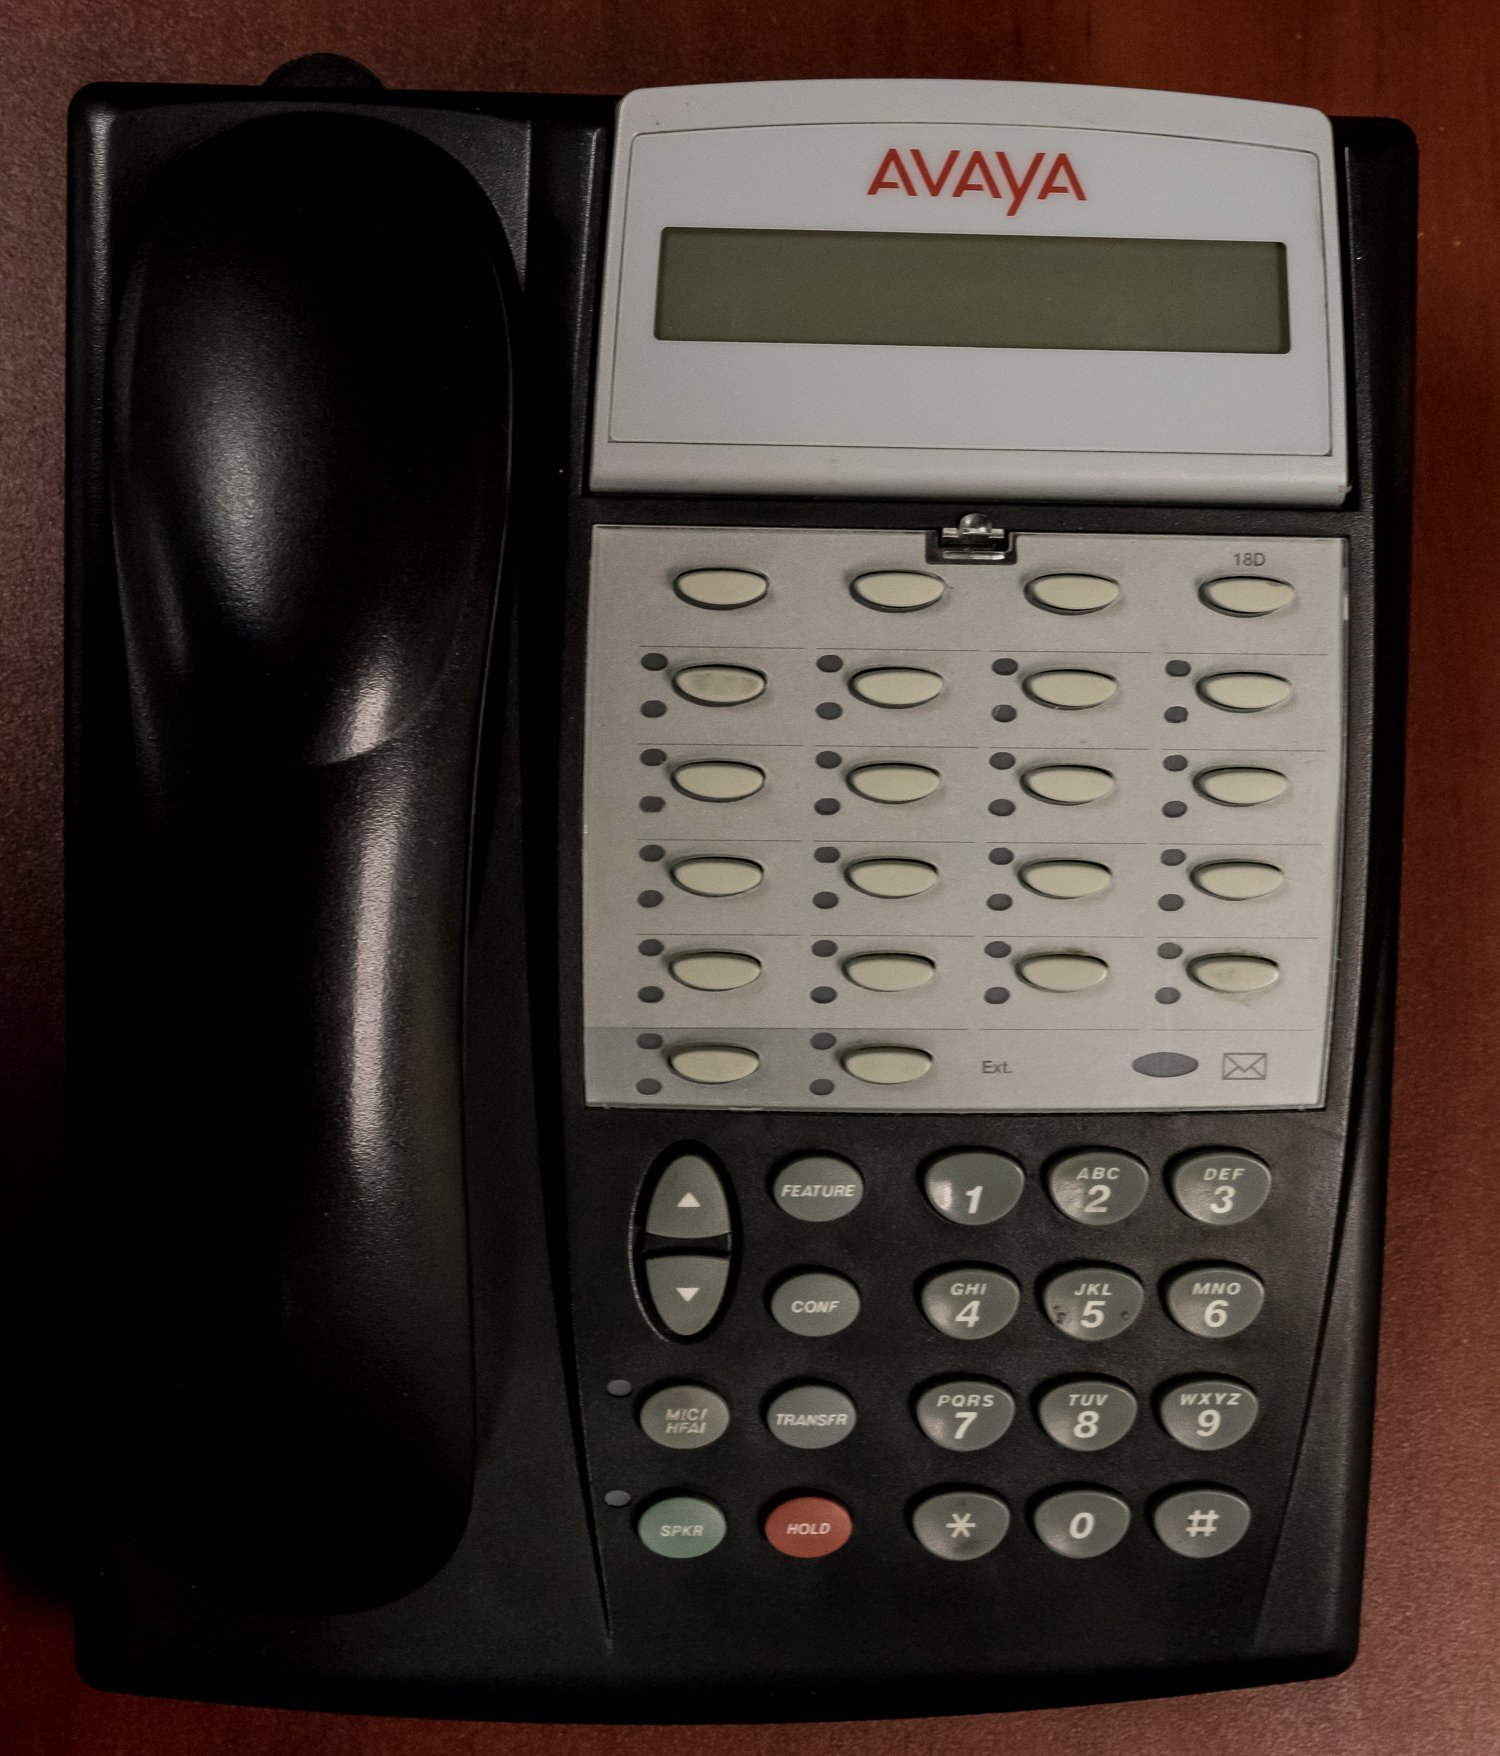 Avaya Replacement phone